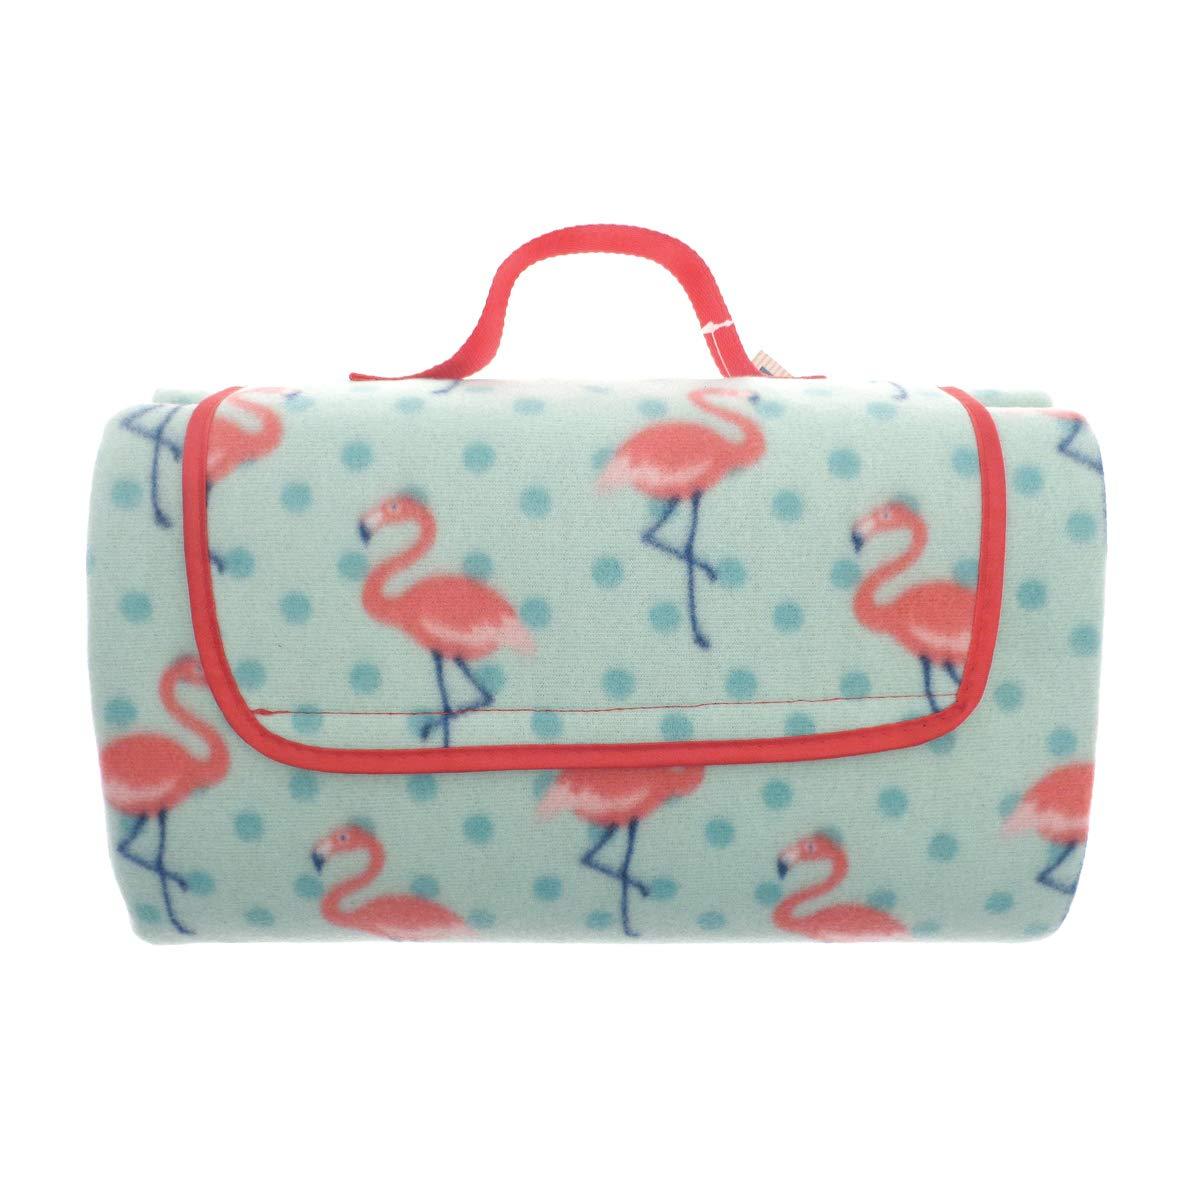 Al Fresco Waterproof Fleece Picnic Blanket Flamingo Beamfeature